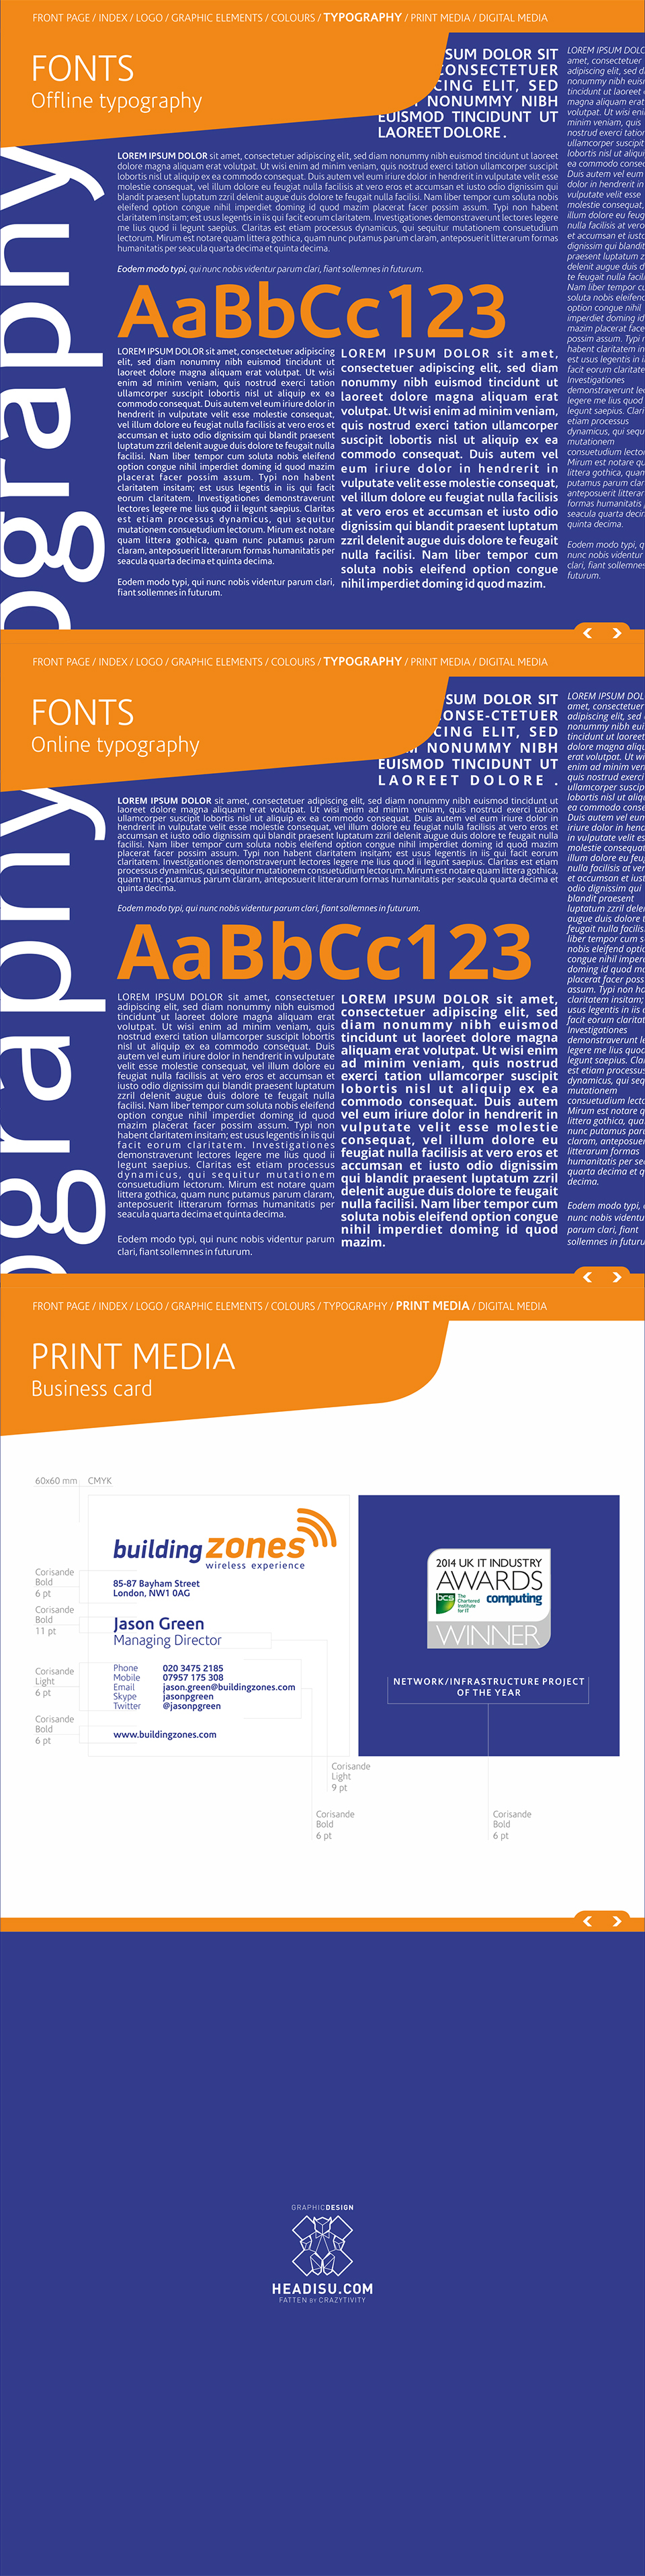 BuildingZones-cvi-3